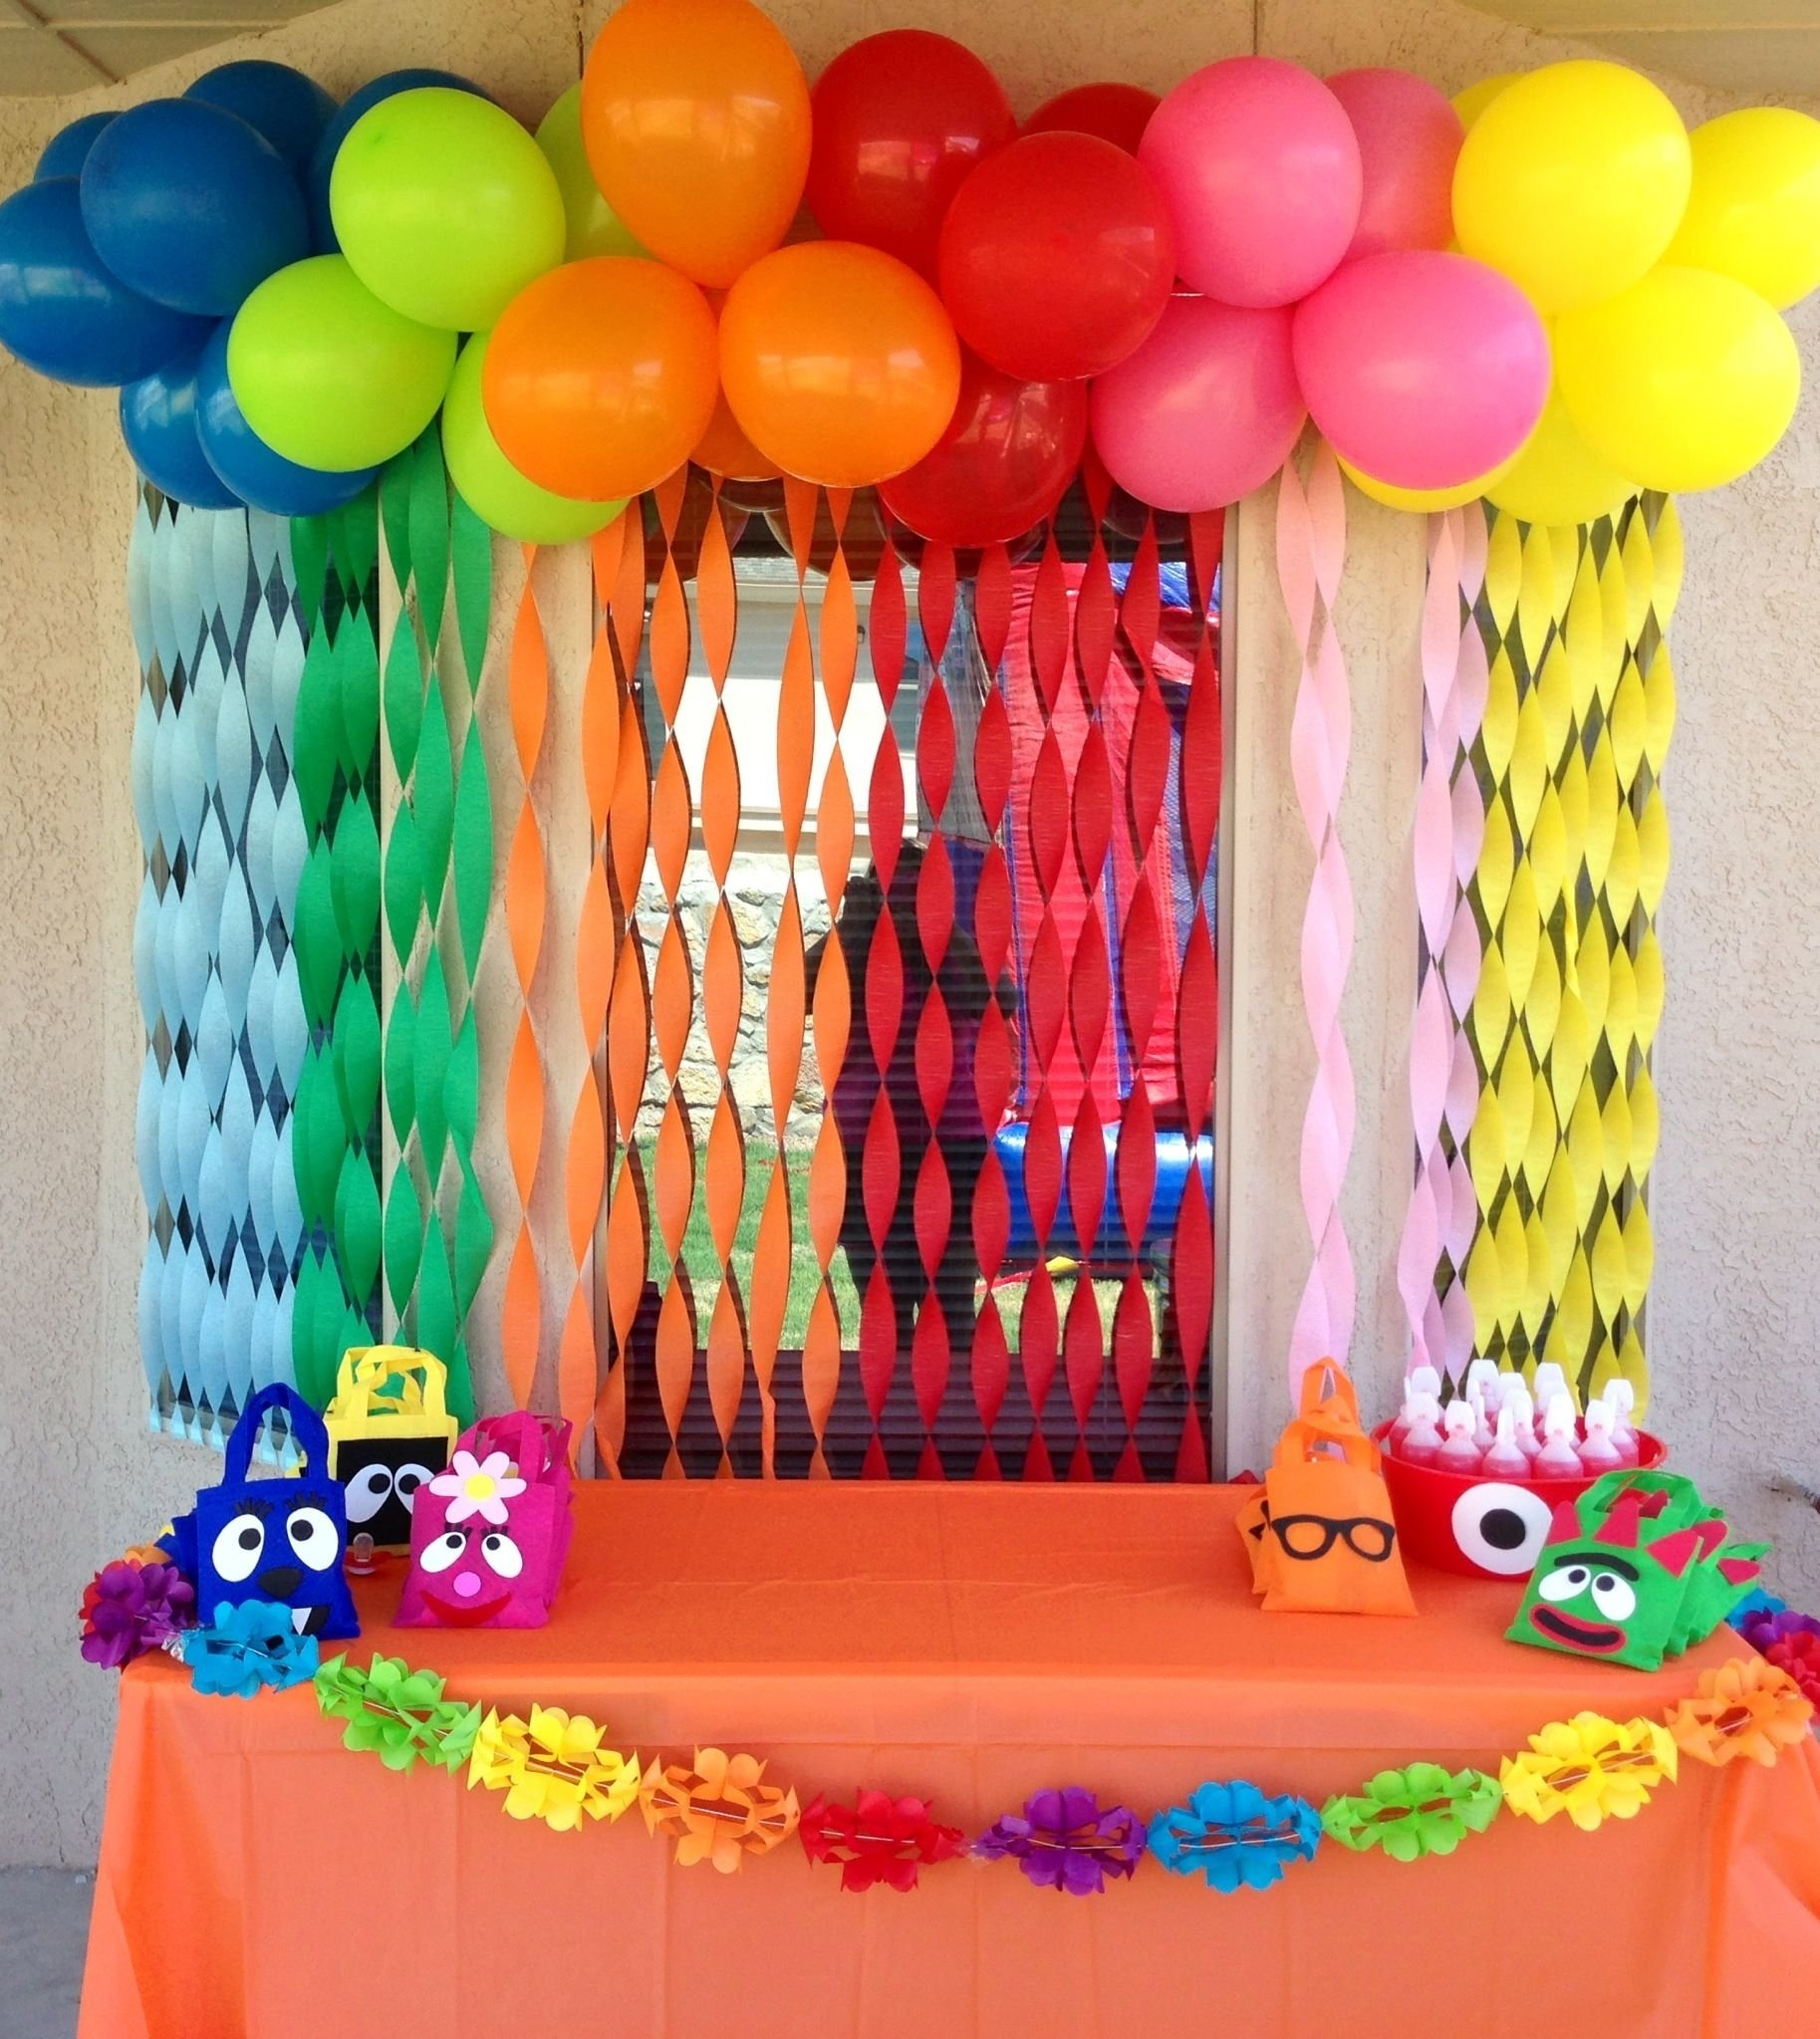 10 Spectacular Decoration Ideas For Birthday Party yo gabba gabba birthday party birthdays pinterest yo gabba 3 2020